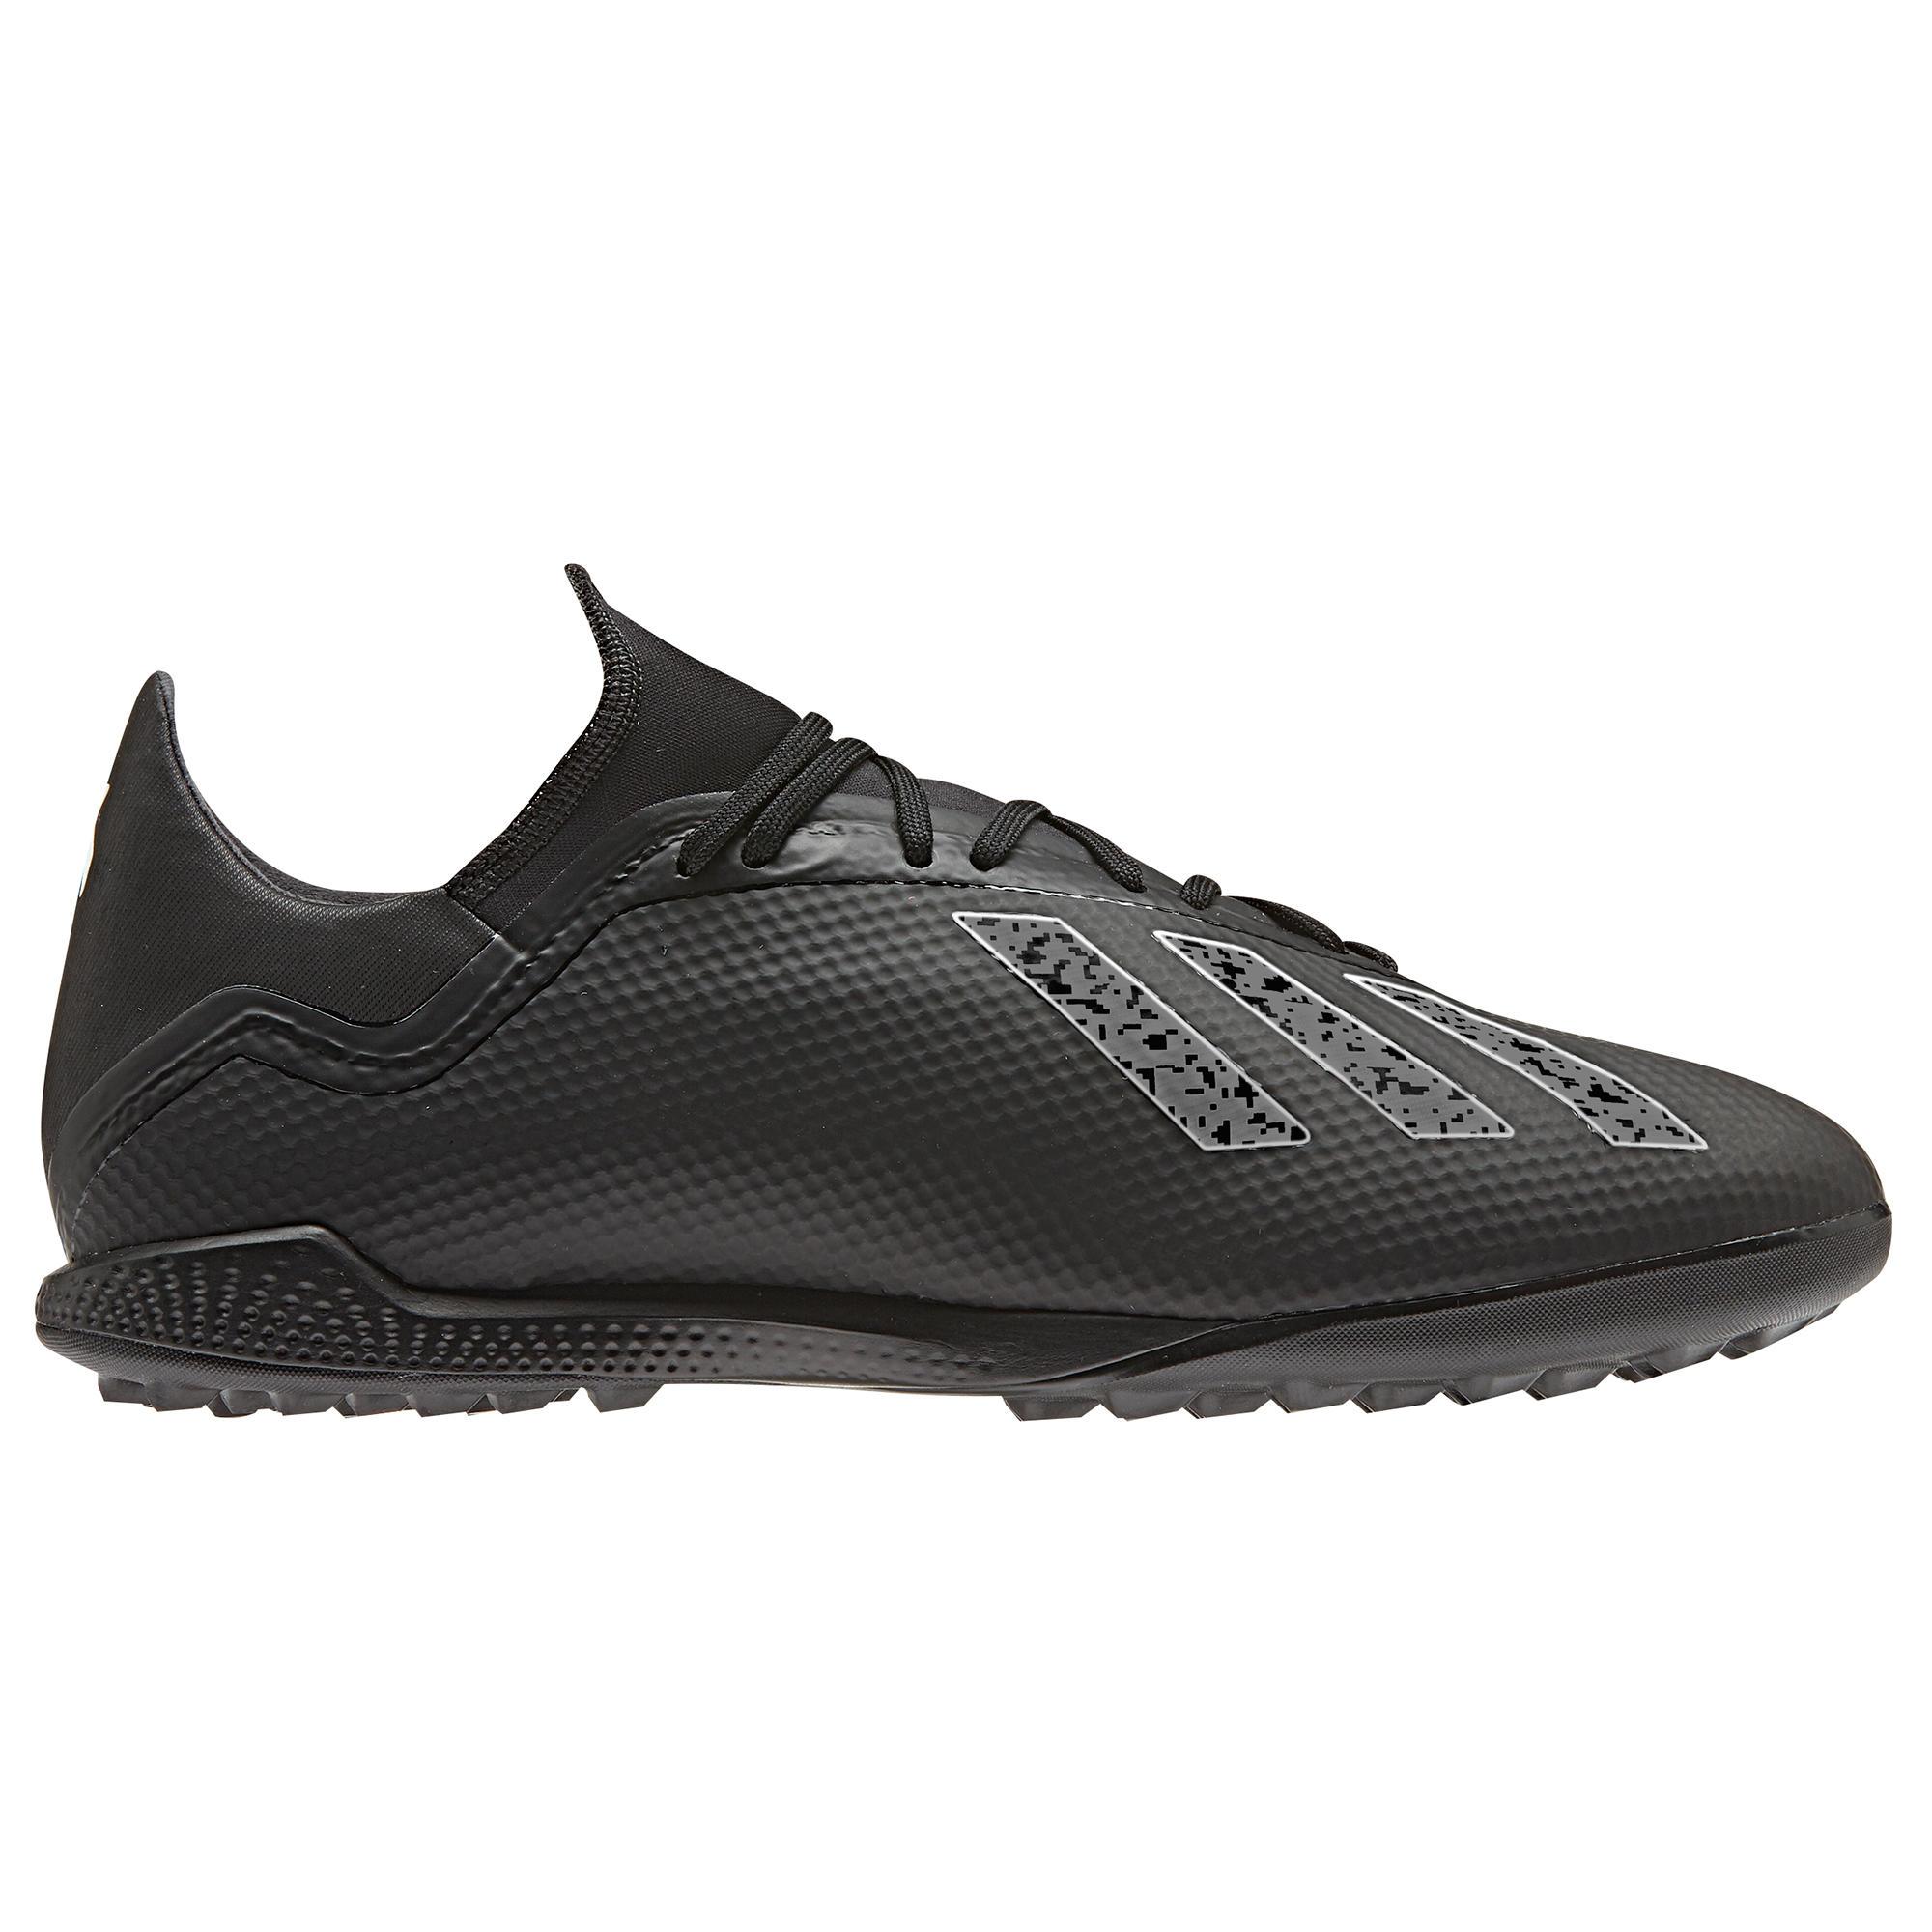 Botas de fútbol adulto X 18.3 HG negro Adidas  e55df232c3fb9